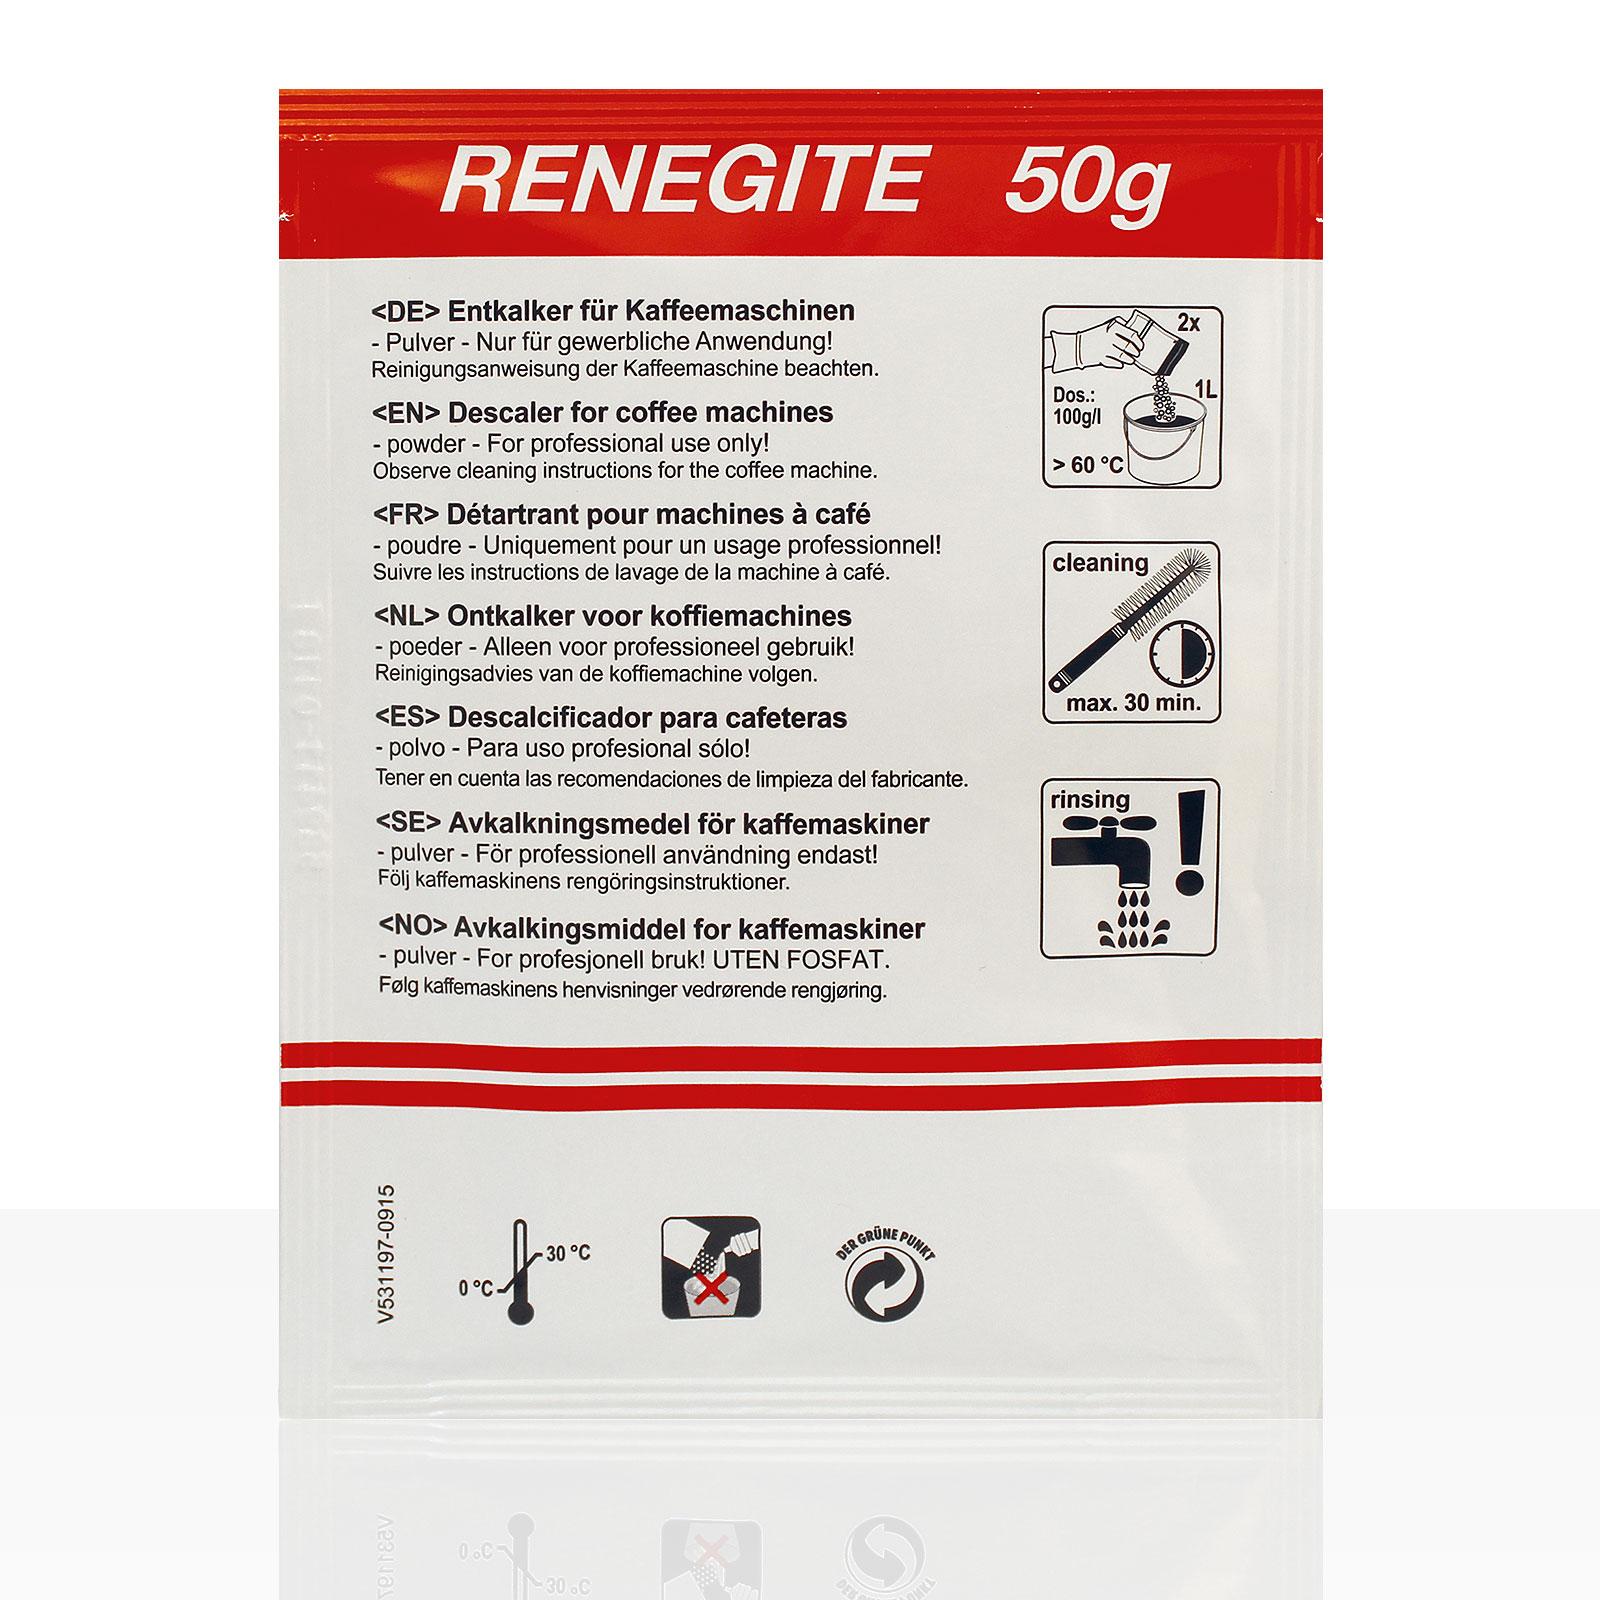 Bonamat Renegite Entkalker-Pulver 60 x 50g Portionsbeutel